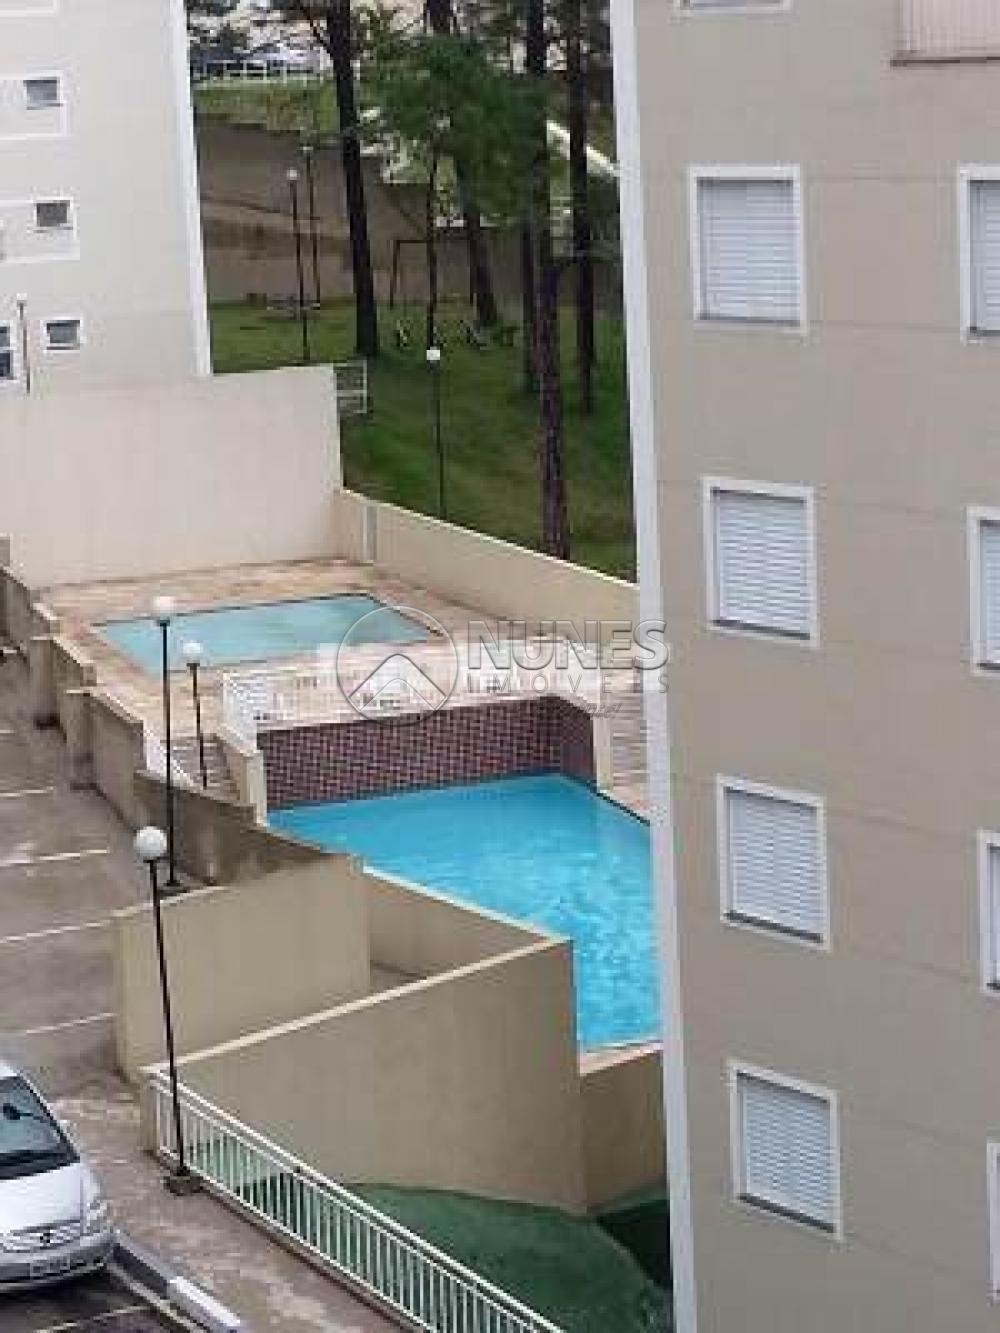 Comprar Apartamento / Cobertura Duplex em Cotia R$ 400.000,00 - Foto 2